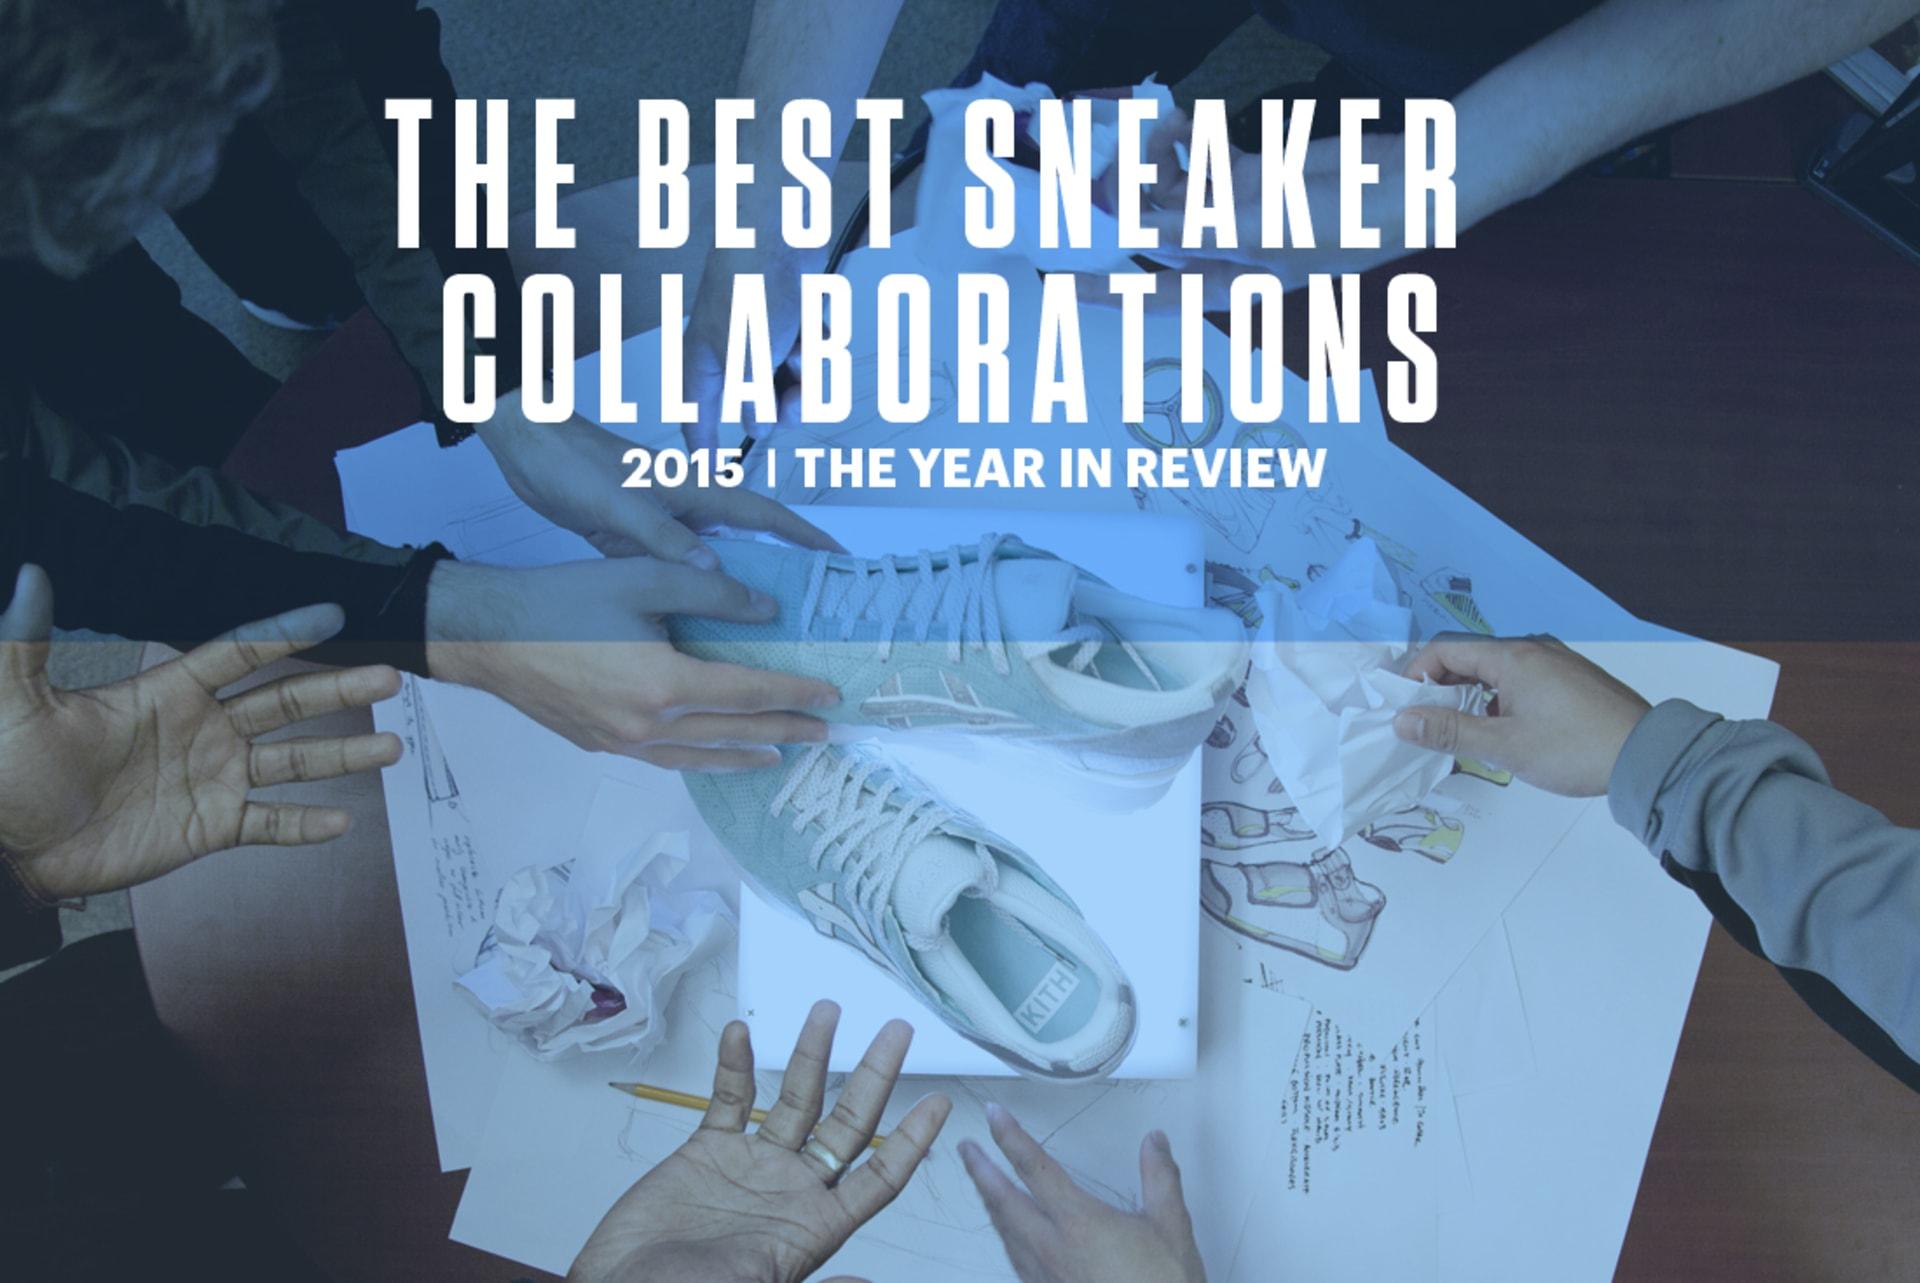 dress - Unveils joseph 25th anniversary collaborations video